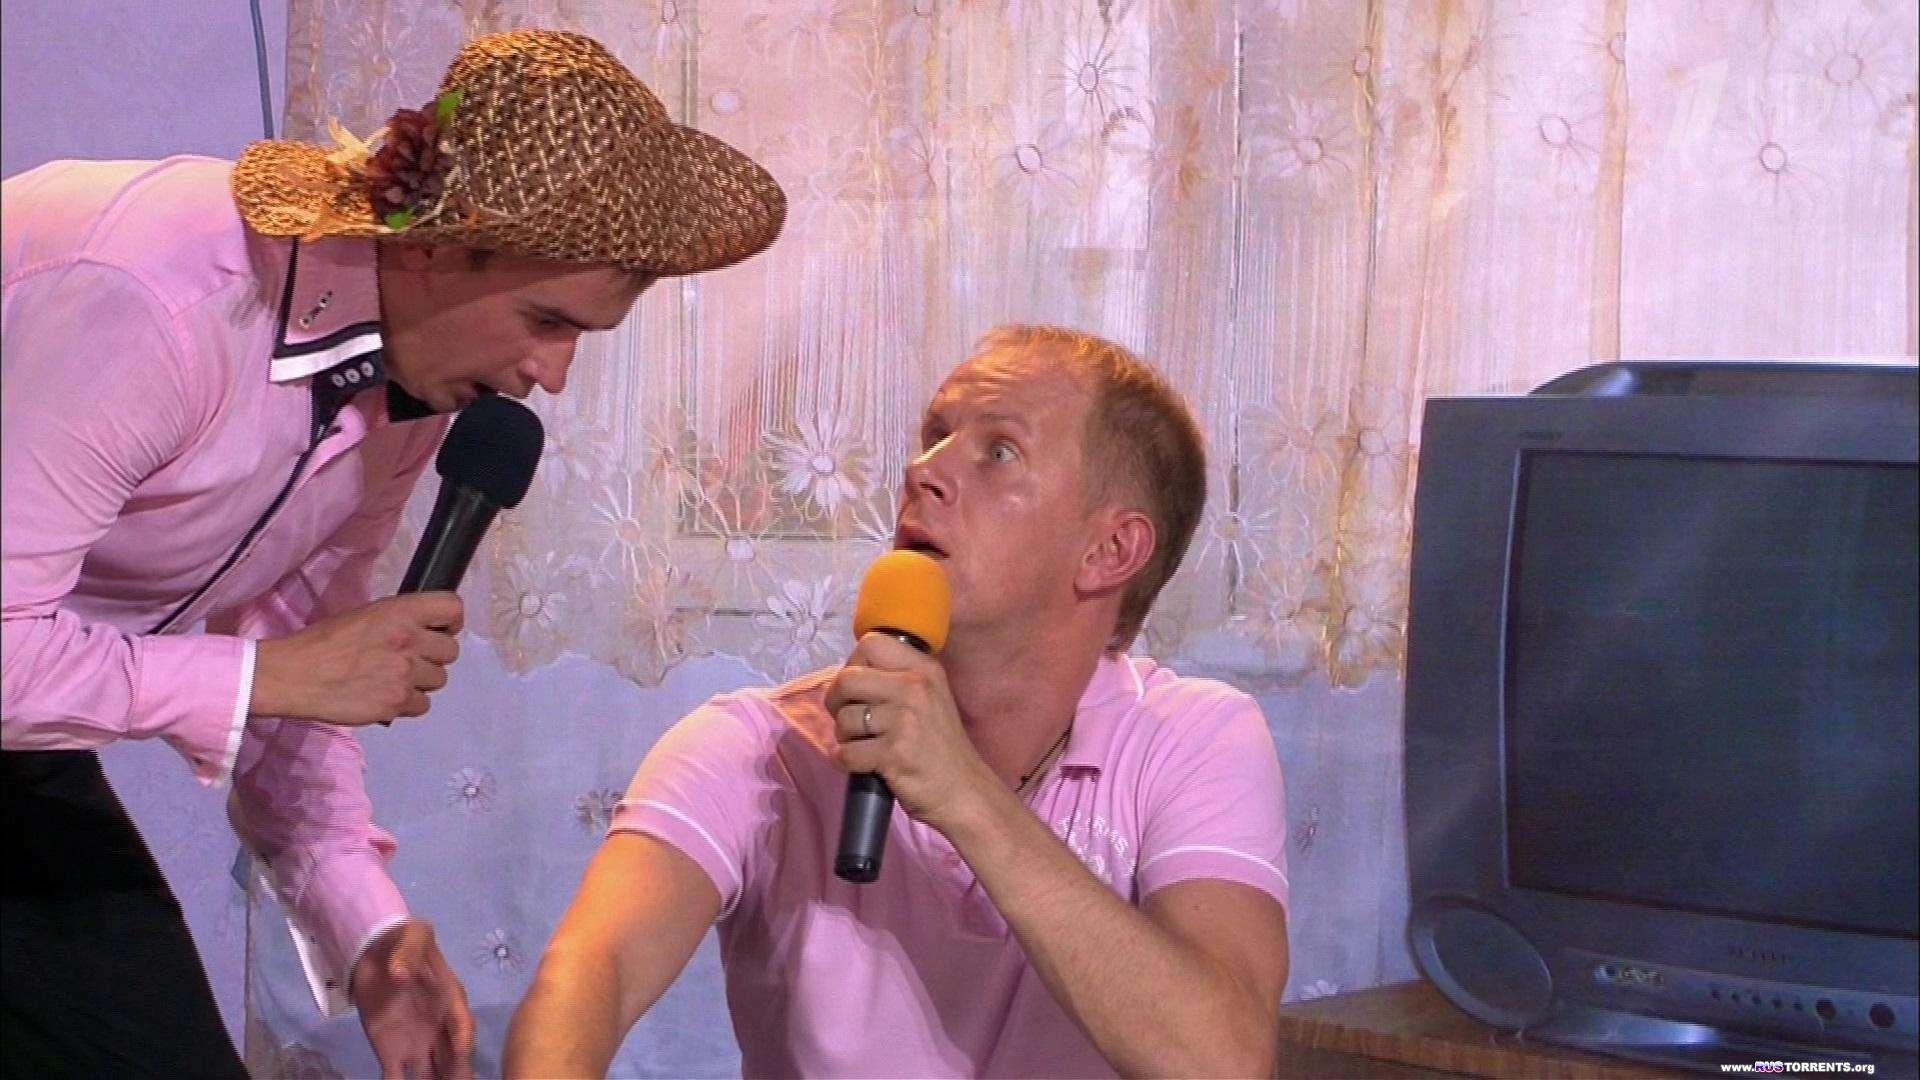 КВН 2014. Летний кубок в Сочи [Эфир от 14.09] | HDTV 1080i